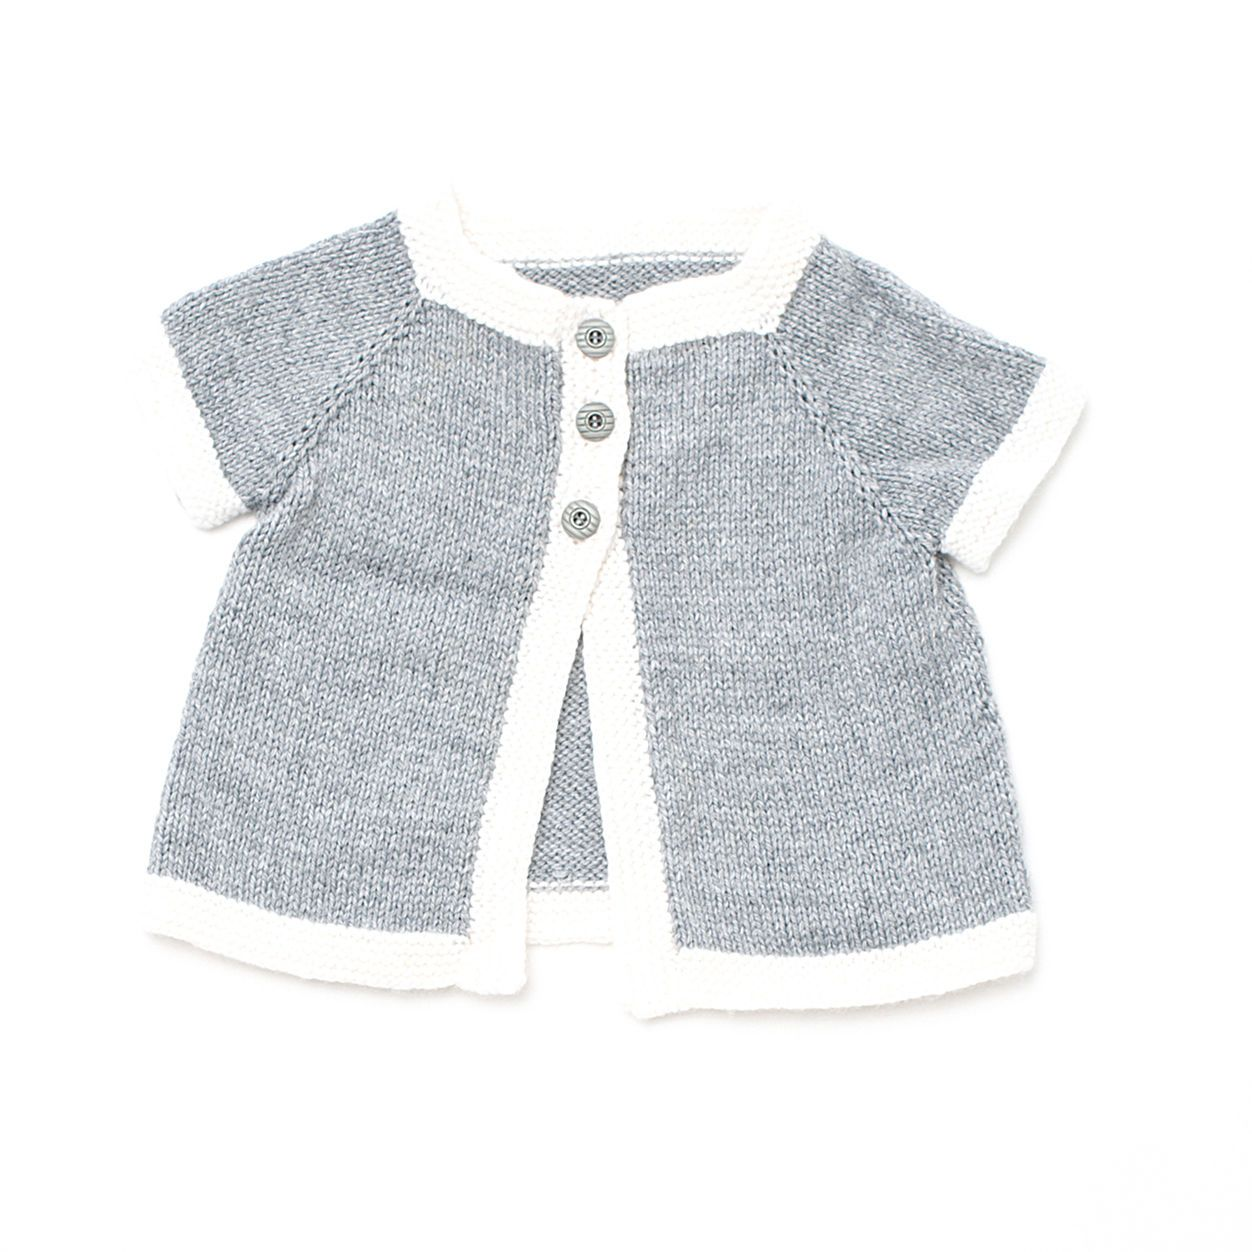 Bernat Top Down Cardigan, 6 mos   Baby sweater patterns ...